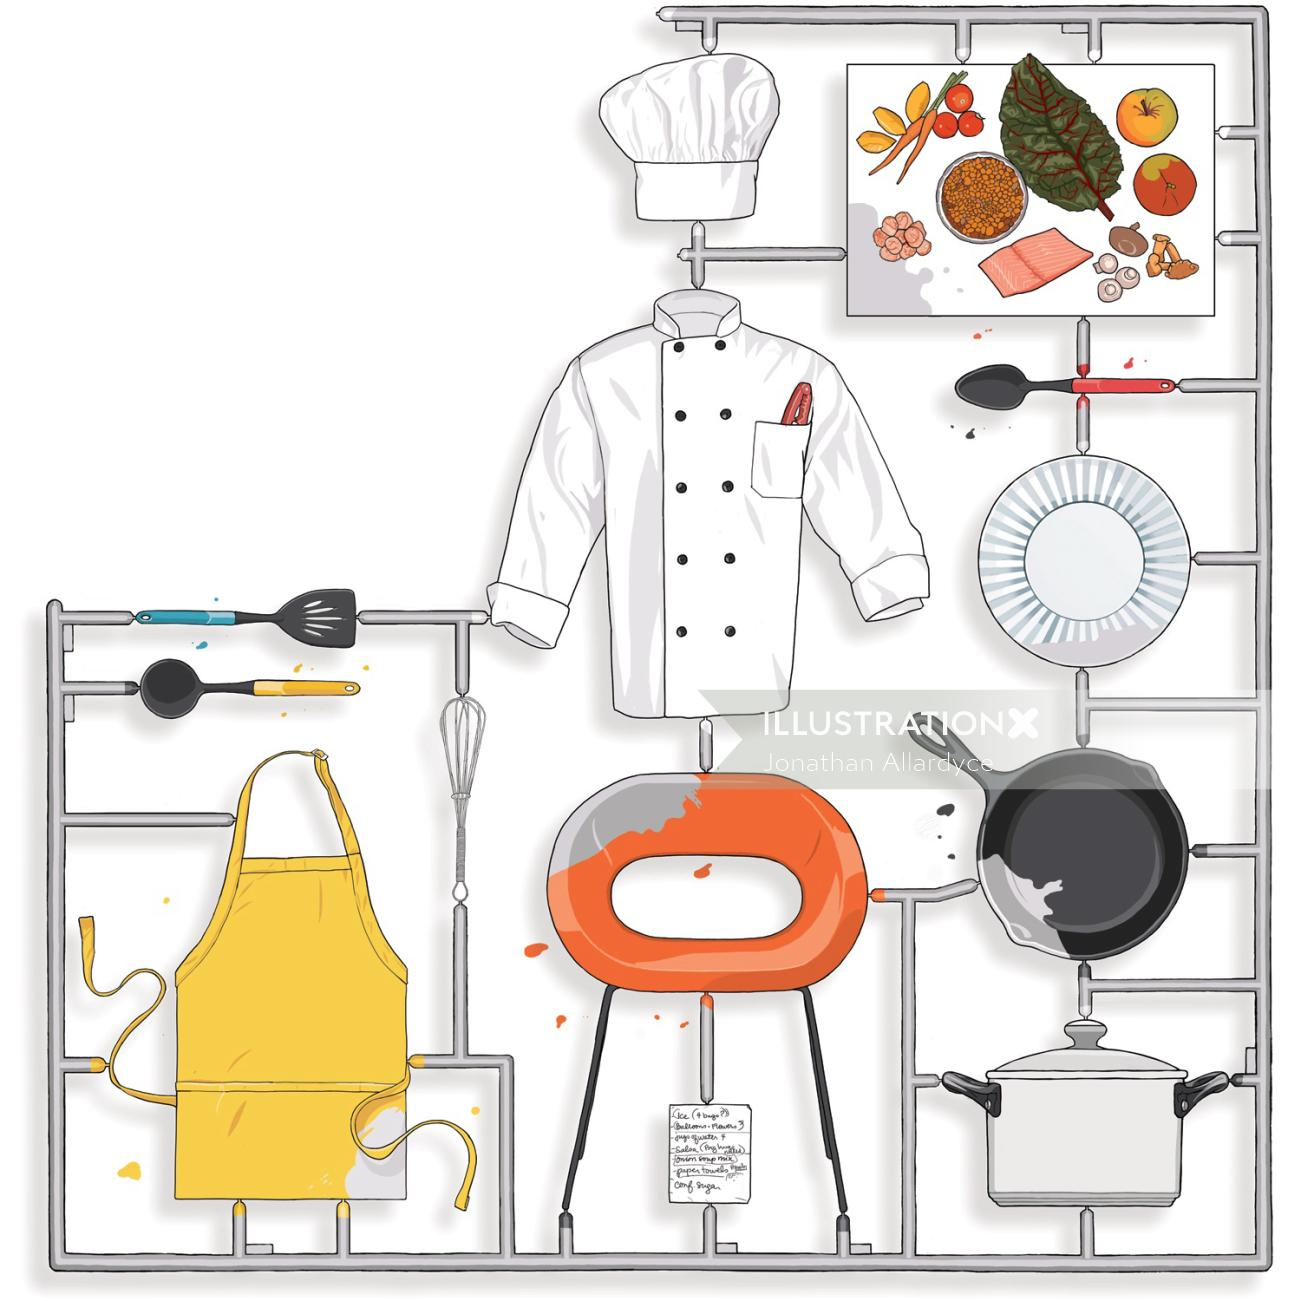 Cheff dress, Kitchen equipment, utensils,